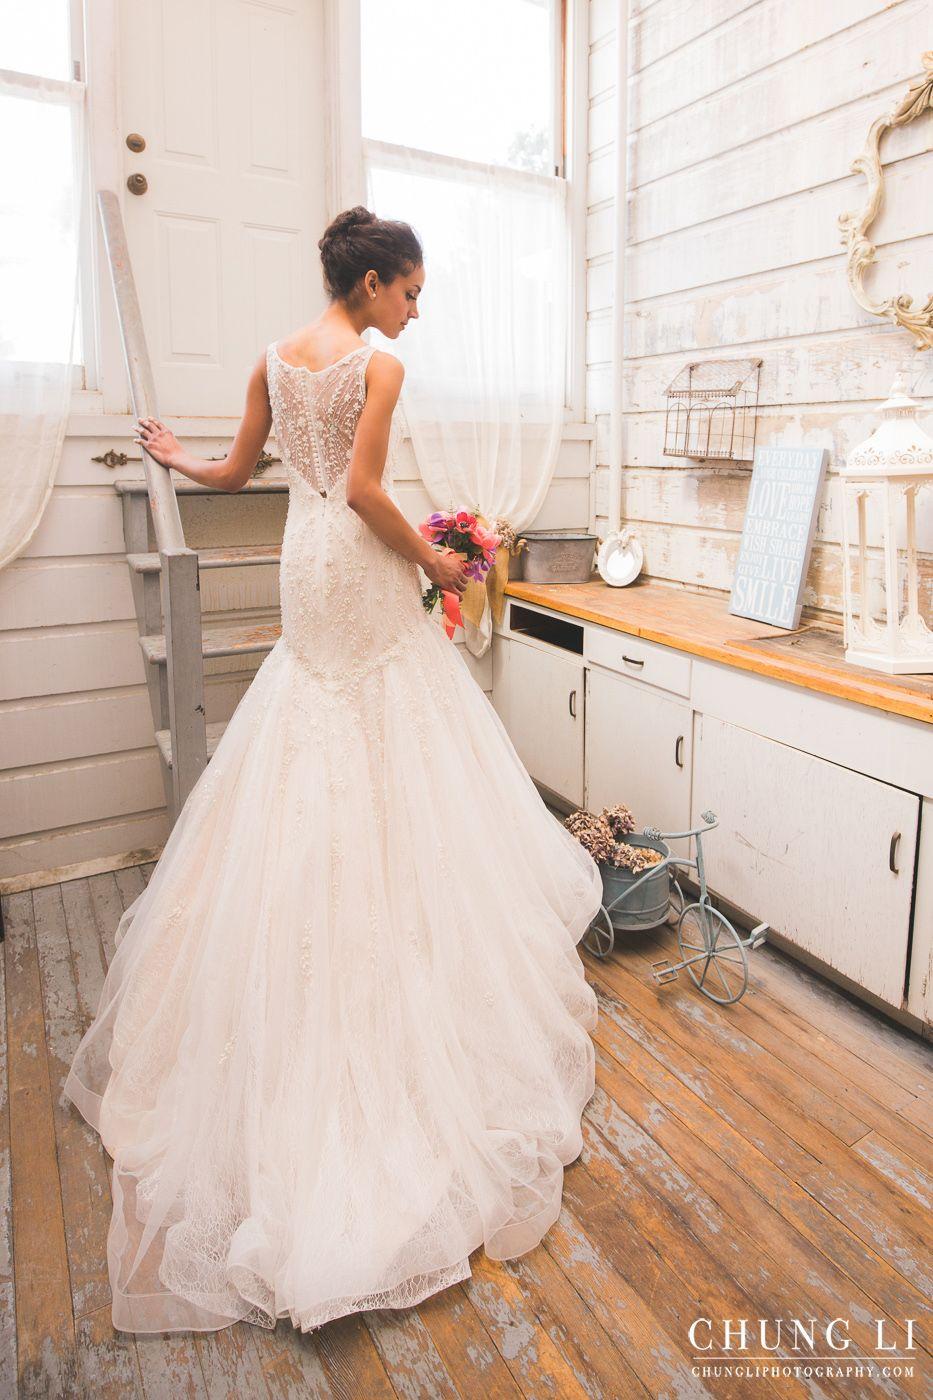 San Francisco Rental Wedding Dress Photoshoot